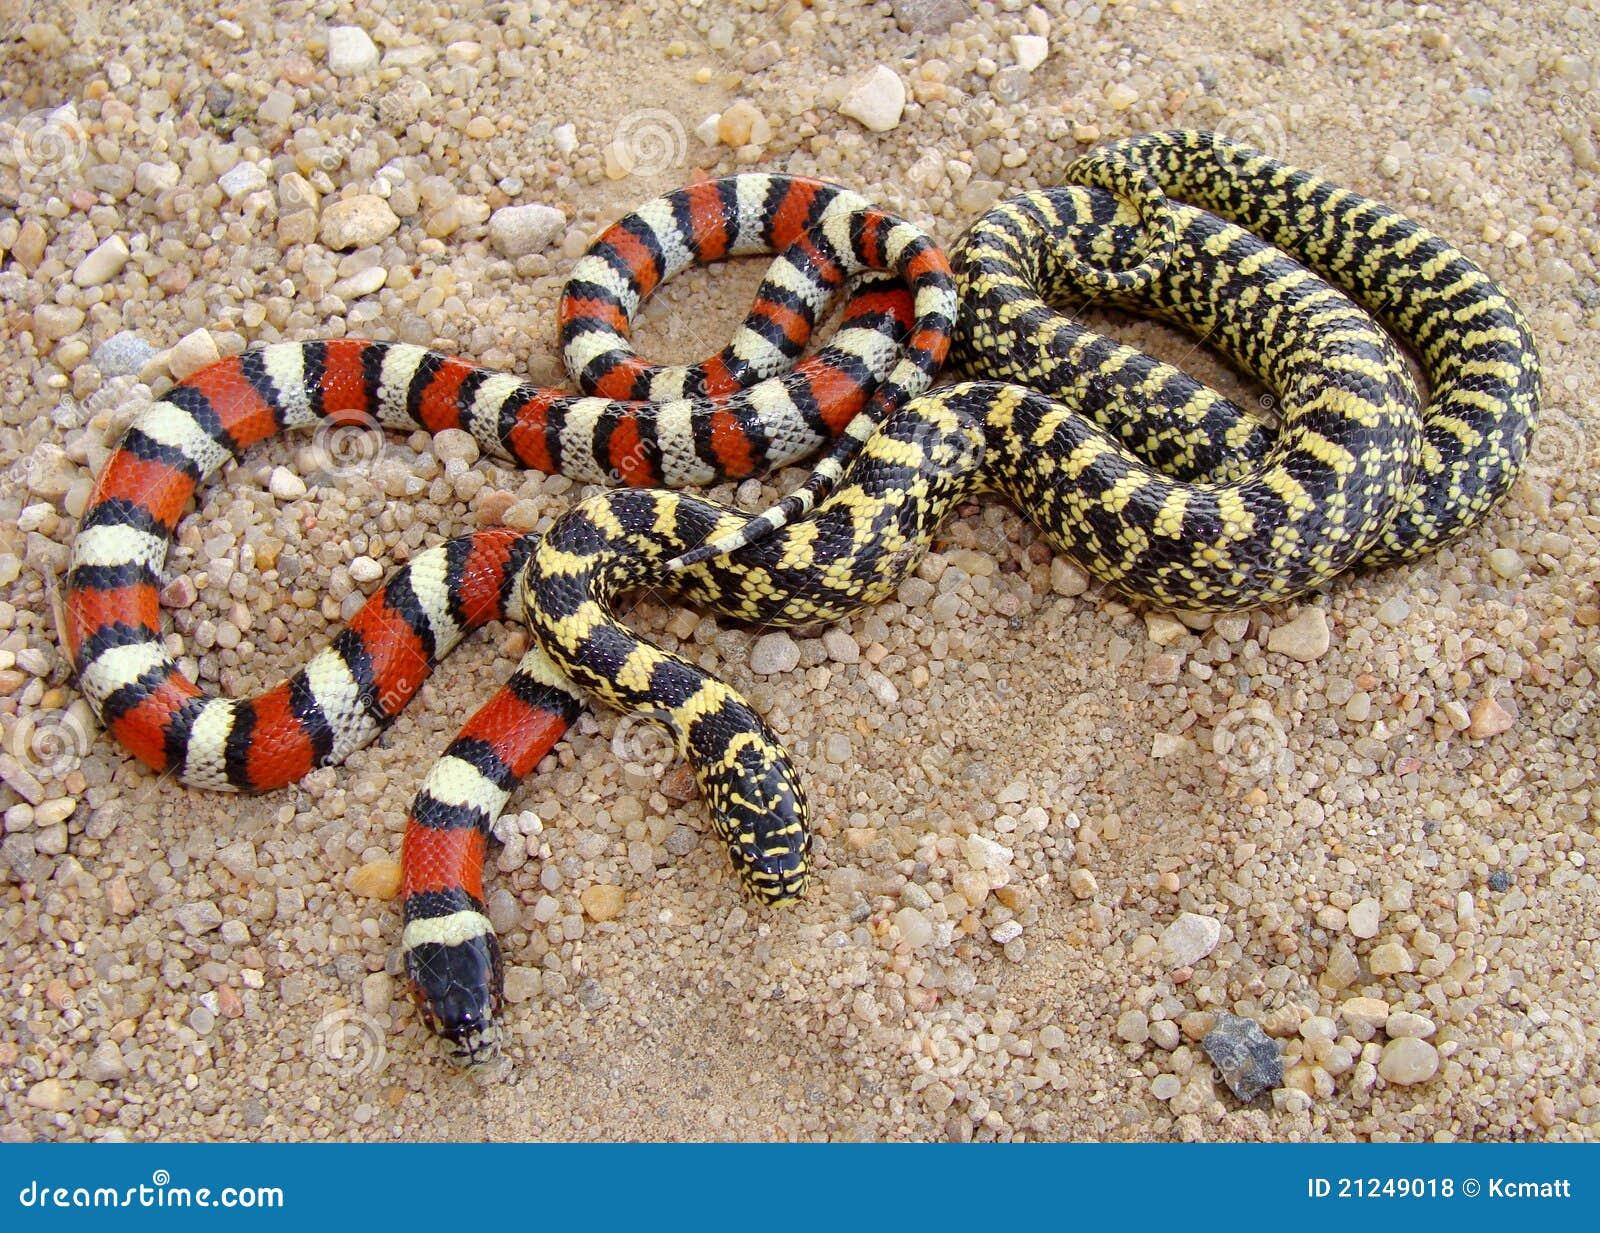 Serpenti Di Sguardo Esotici Due Specie Di Re Serpente